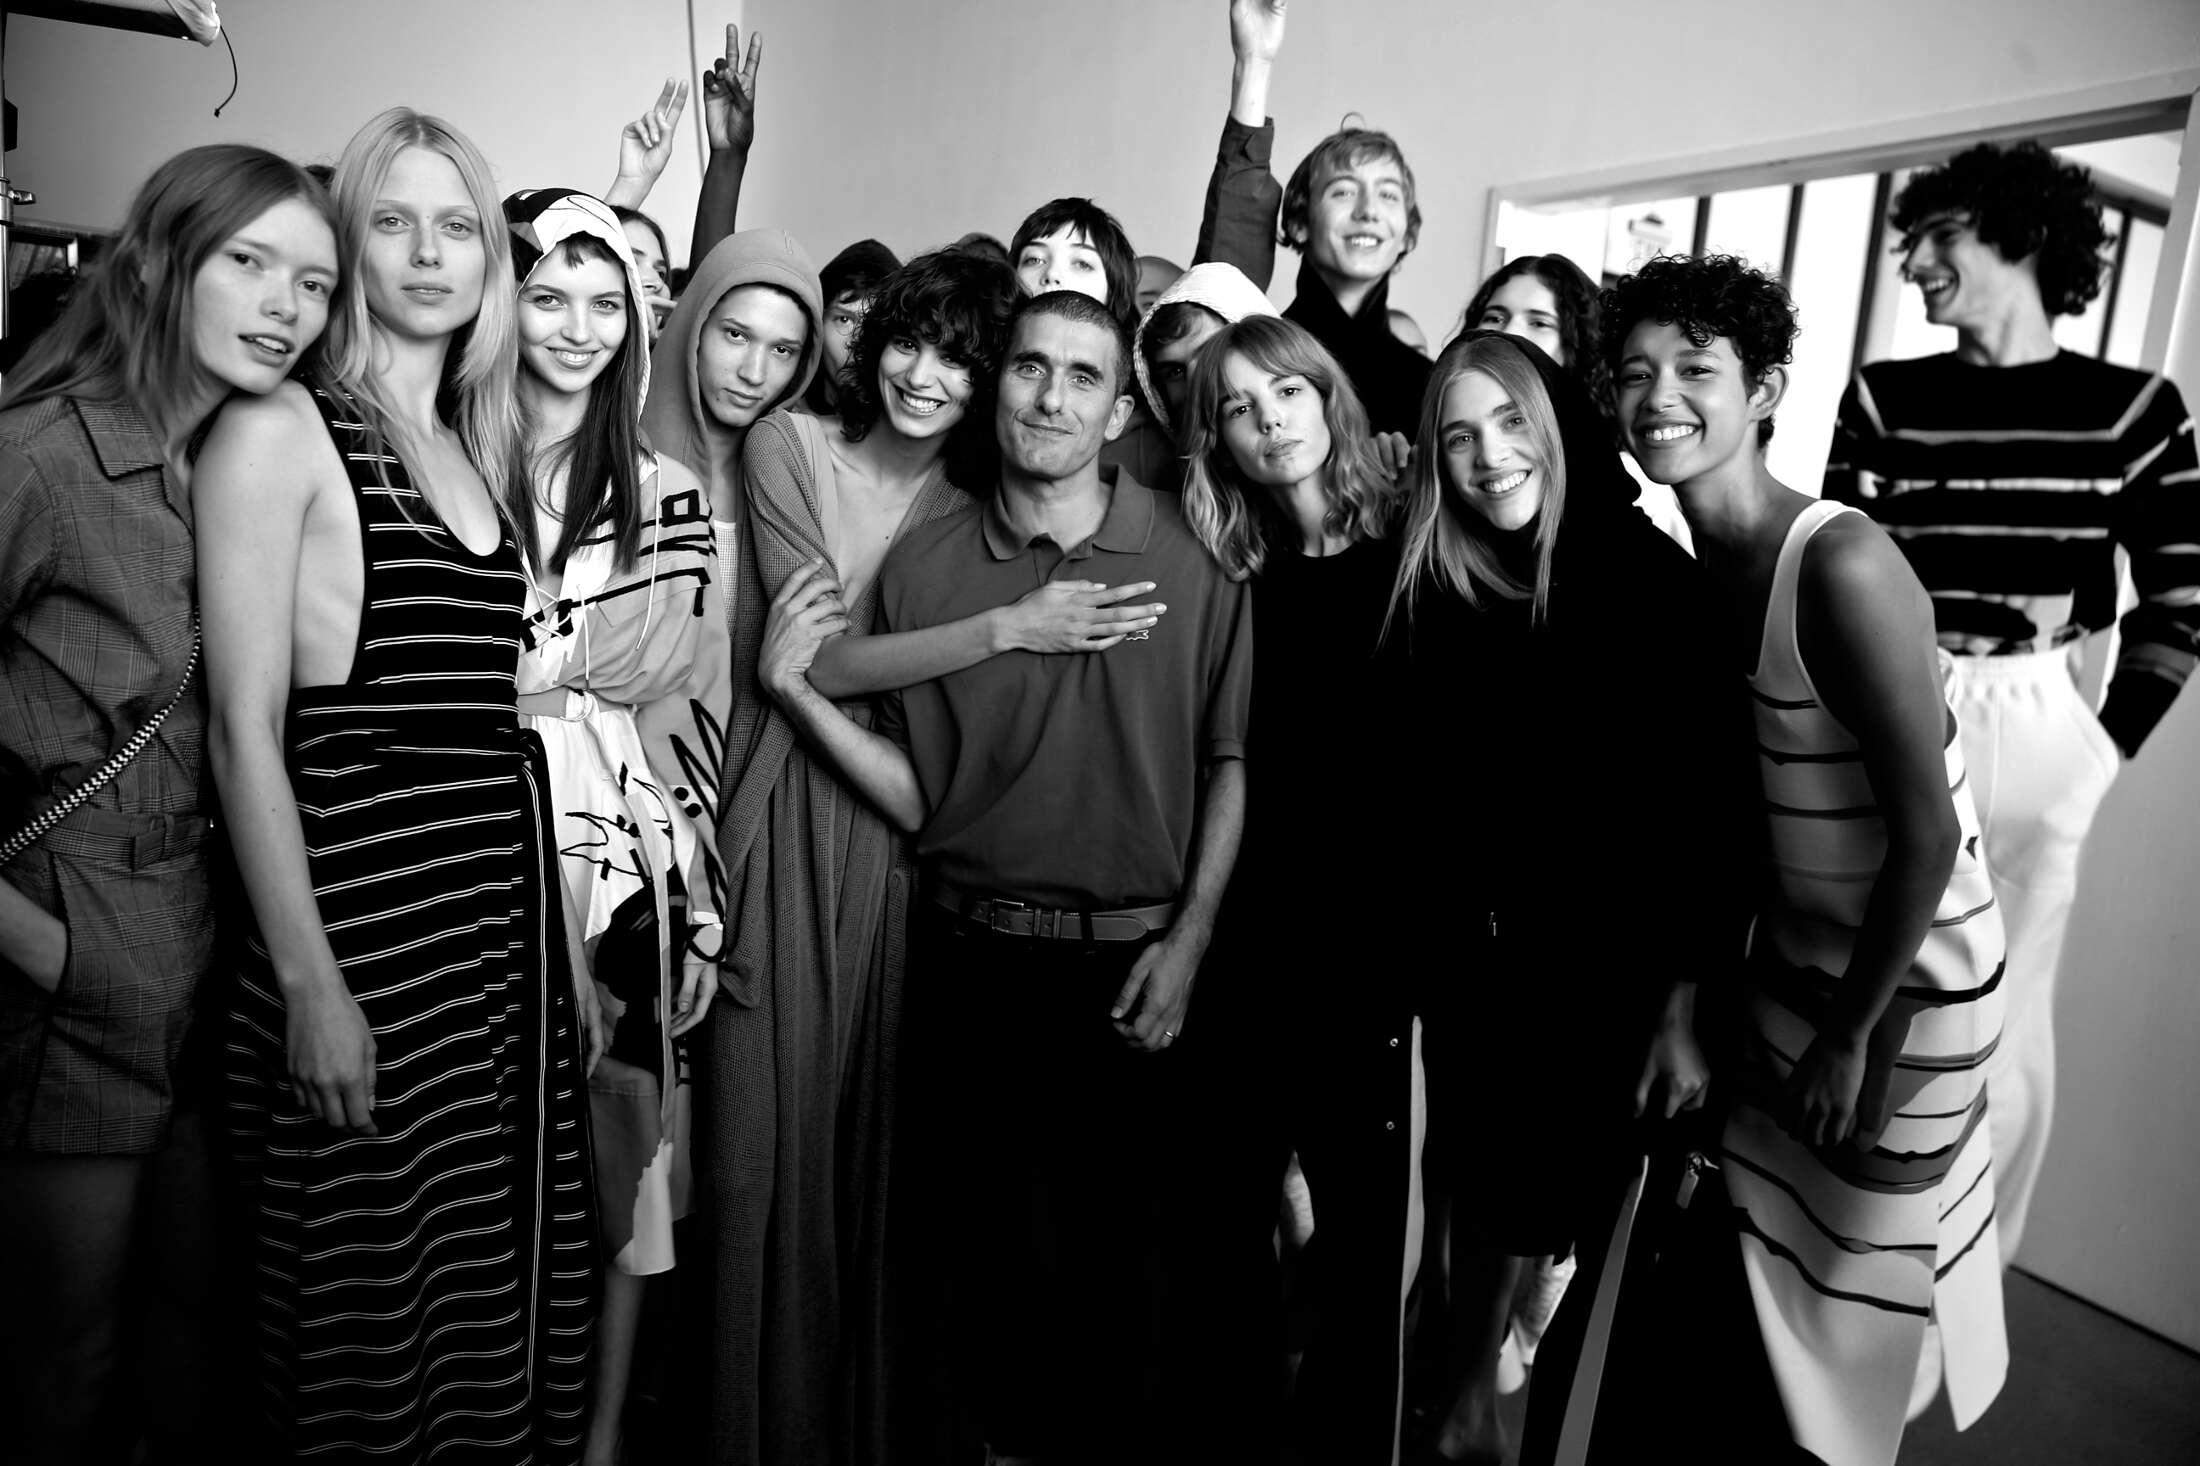 Felipe Oliveira Baptista and Models Lacoste Backstage